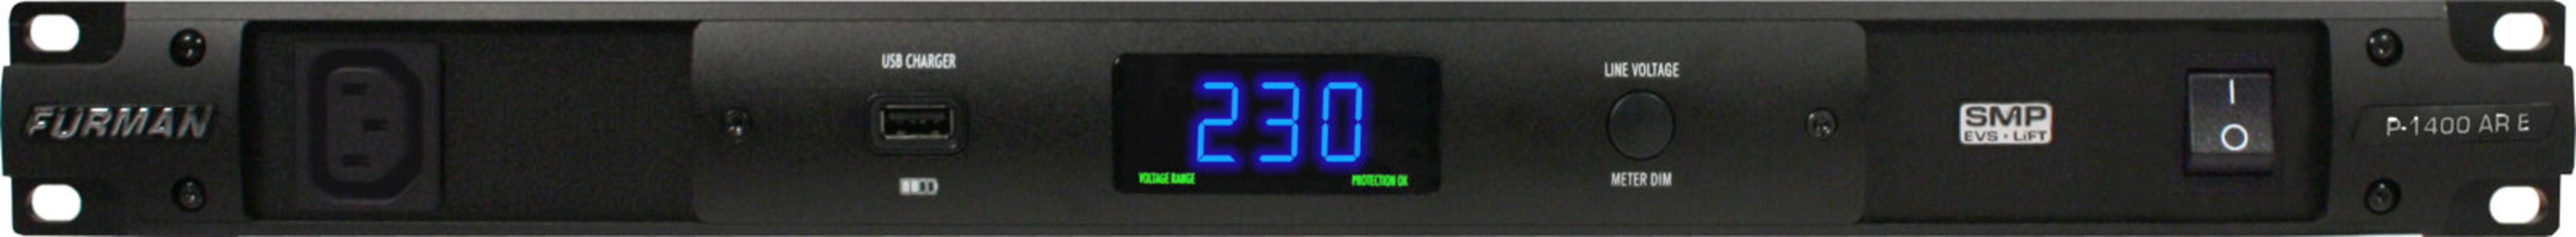 Furmann P-1400 AR E Voltage Regulator / Power Conditioner